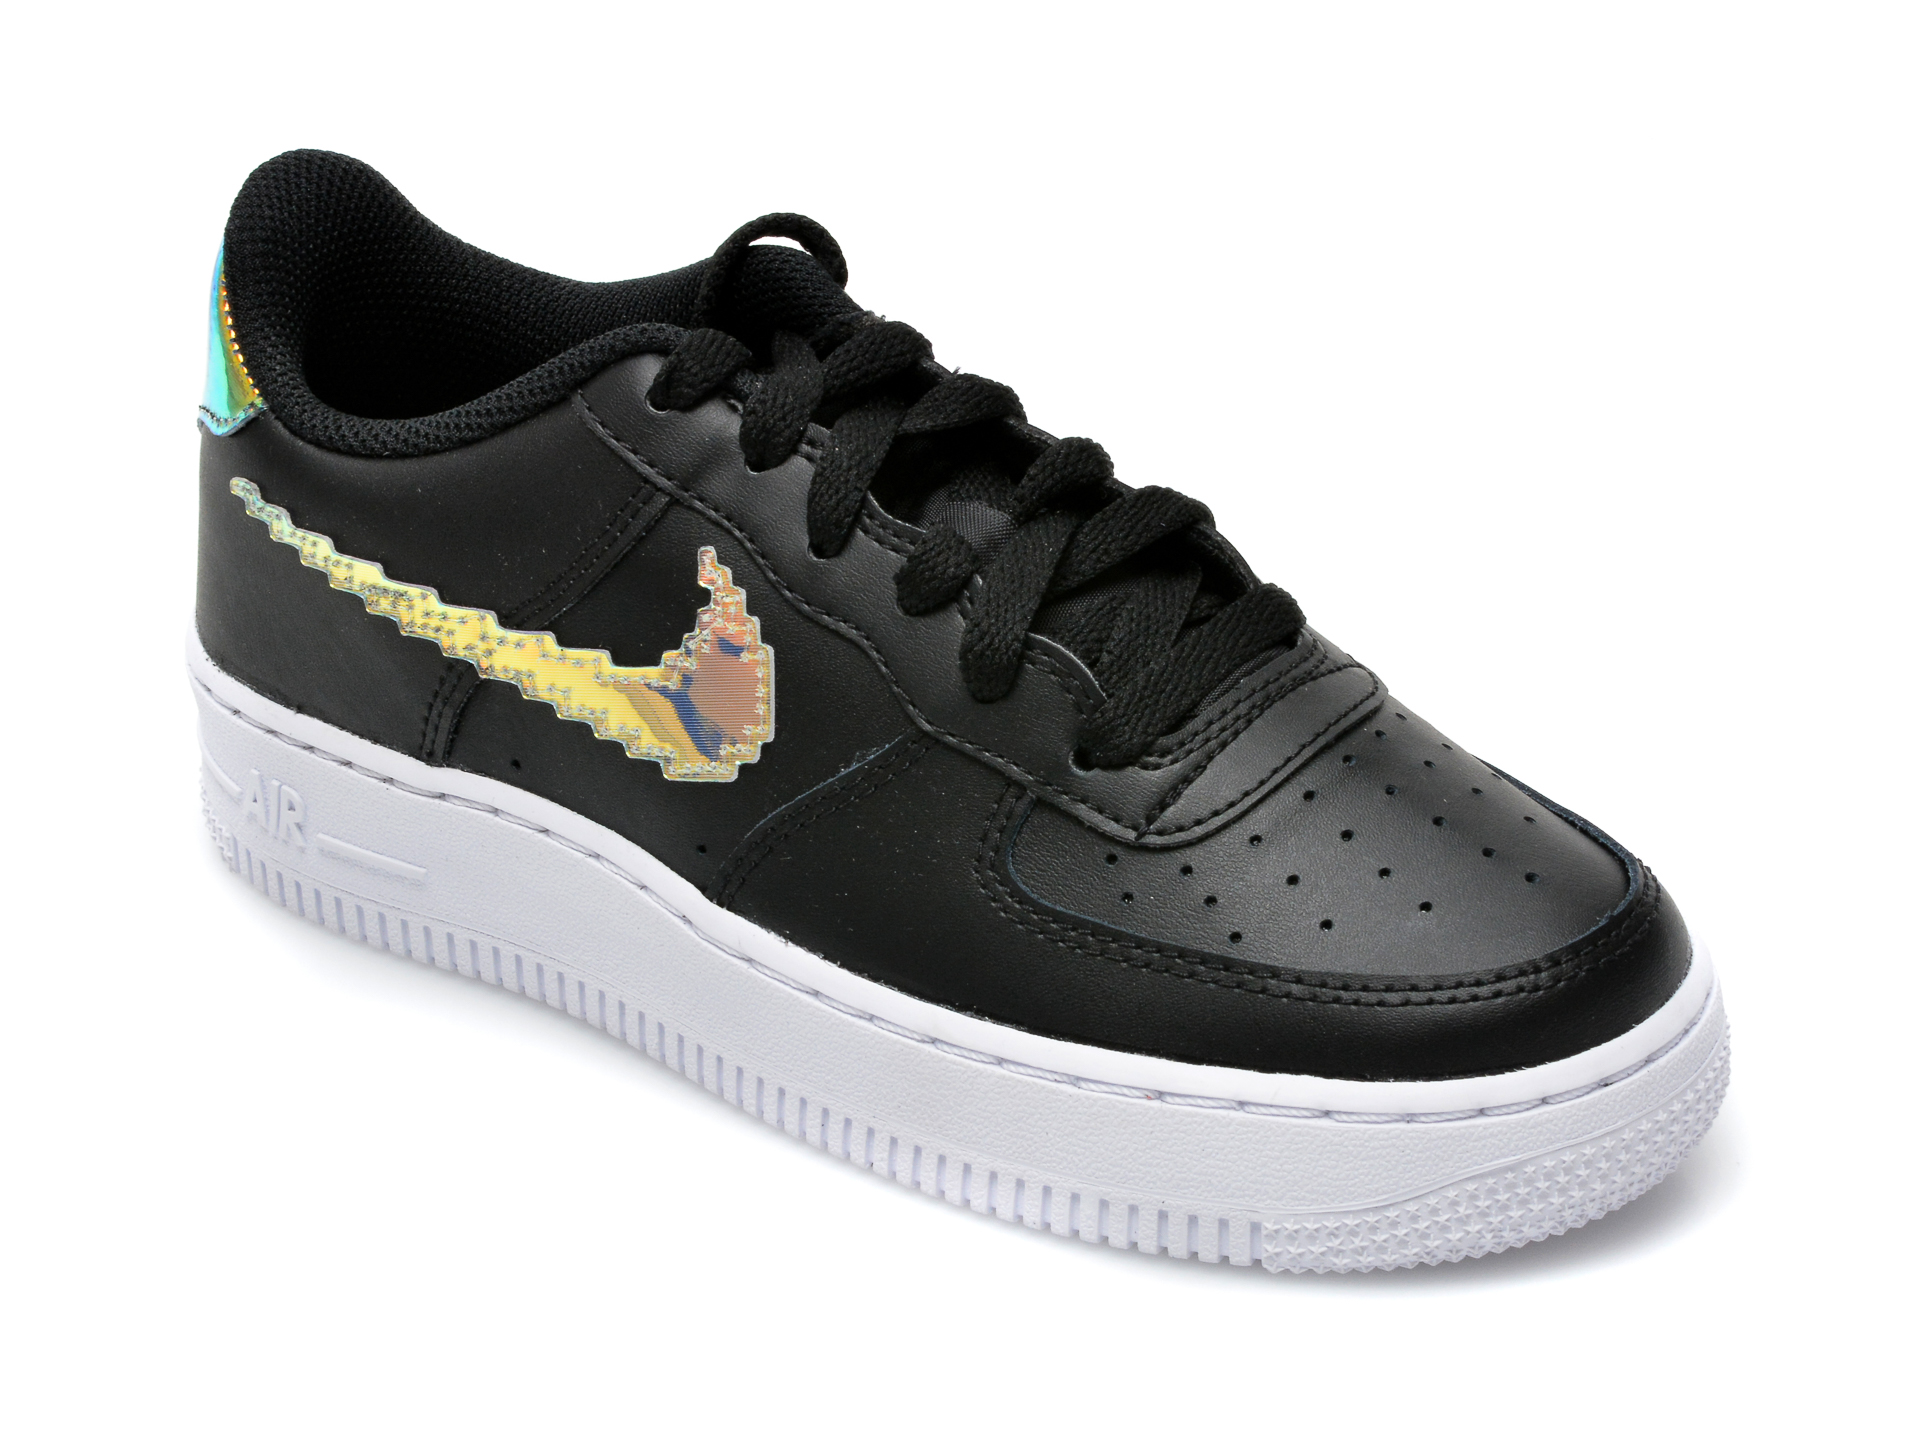 Pantofi sport NIKE negri, AIR FORCE 1 LV8 (GS), din piele naturala